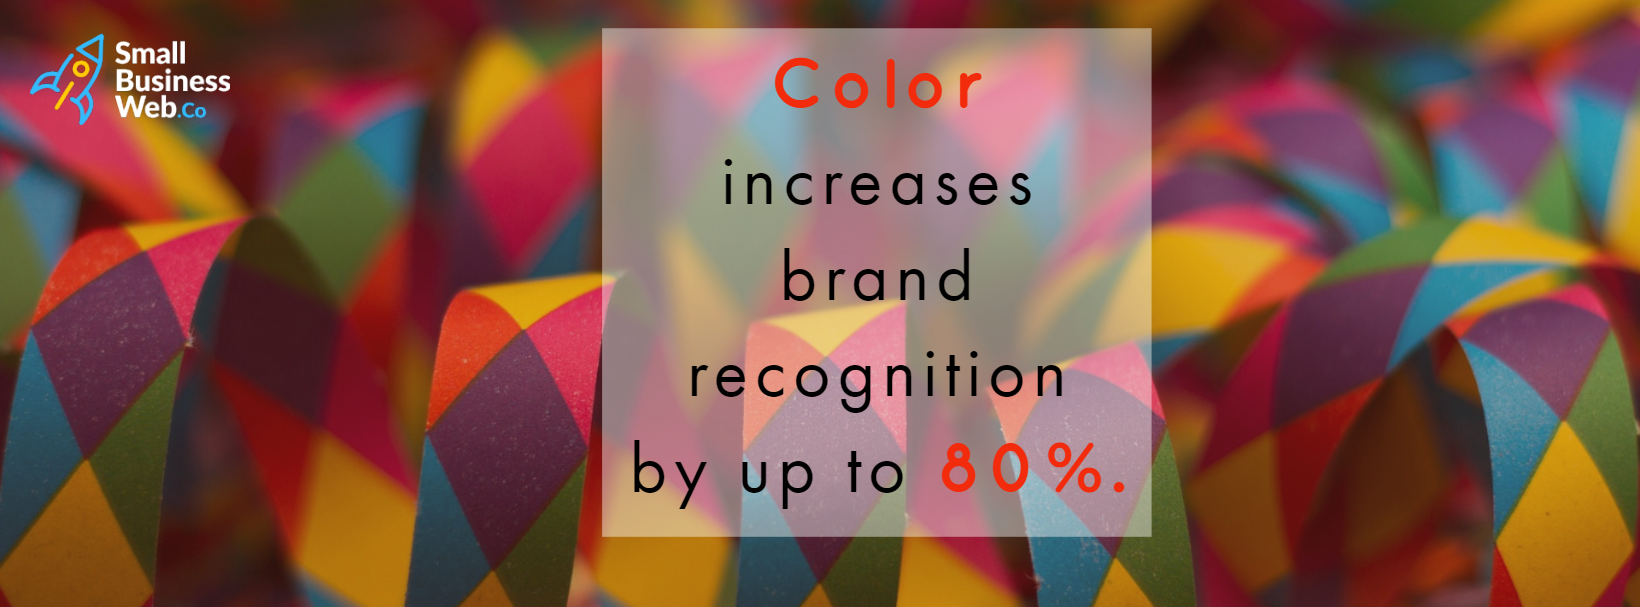 small-business-branding-stats